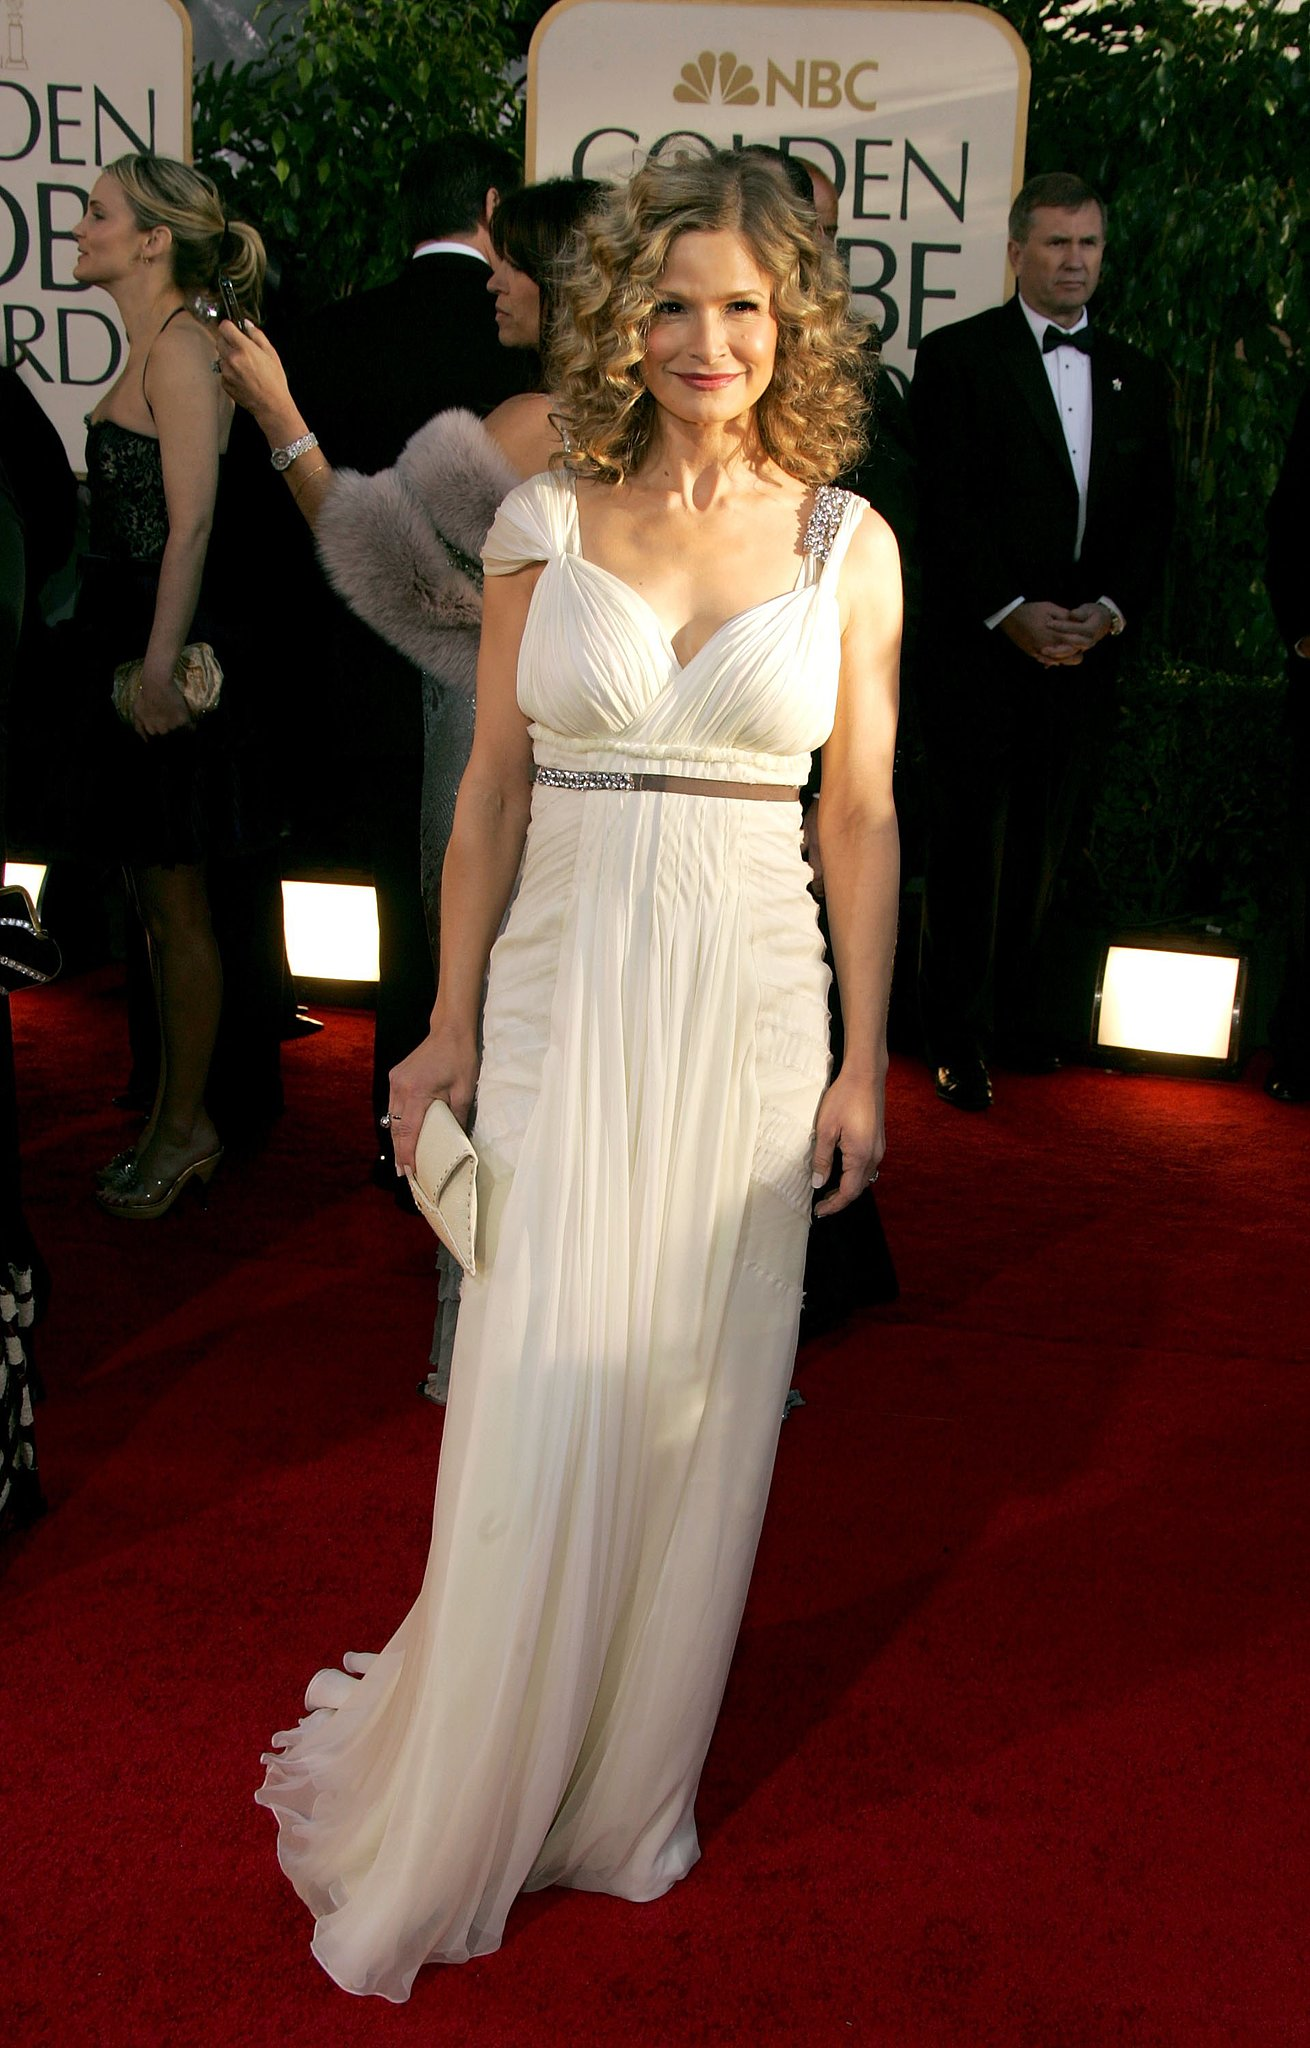 Kyra Sedgwick in 2007.